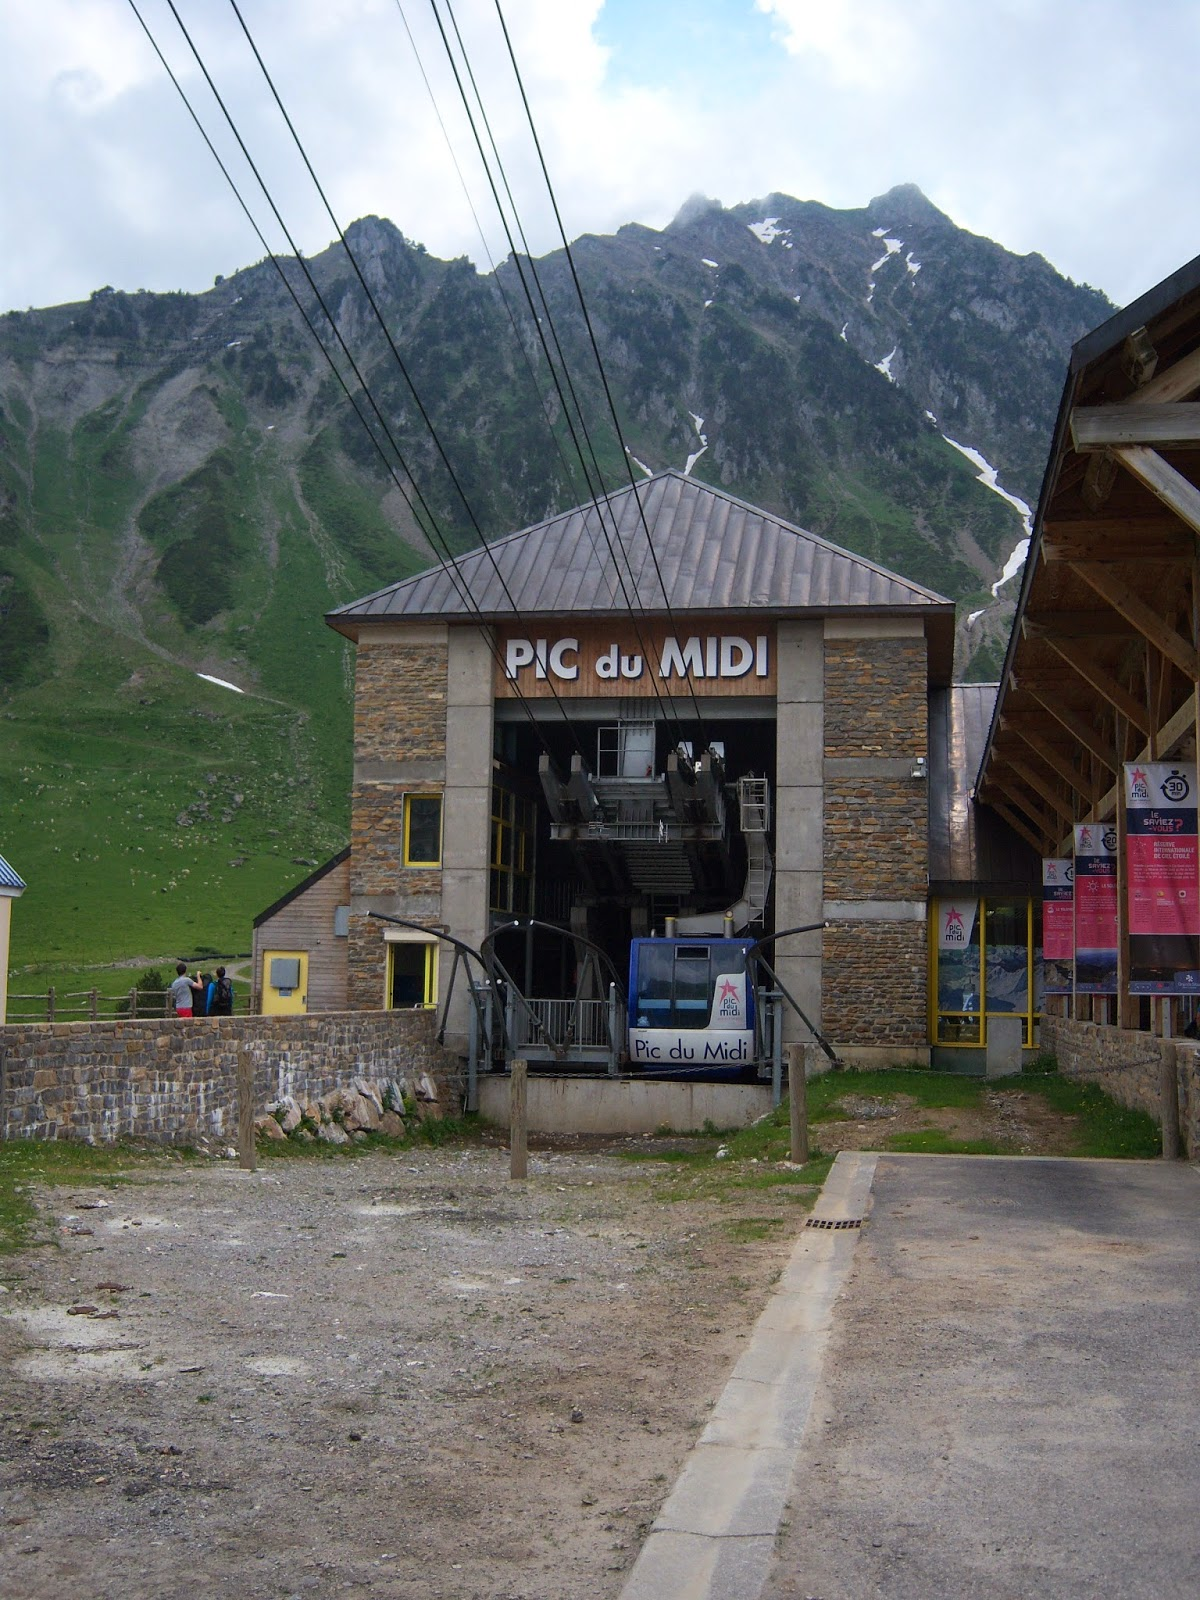 Teleférico Pic du Midi